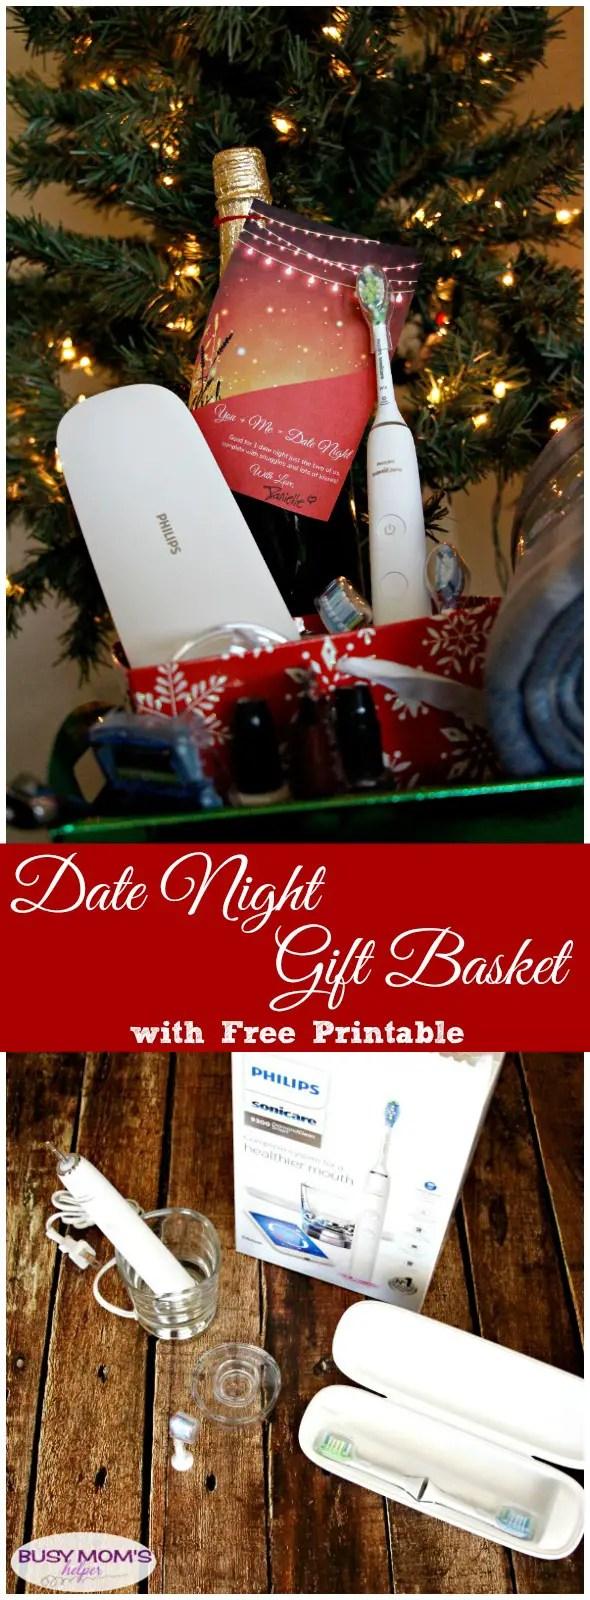 Date Night Gift Basket with Free Printable Gift Tag #AD #WorldsSmartestToothbrush #PhilipsSonicare #OprahsFavoriteThings